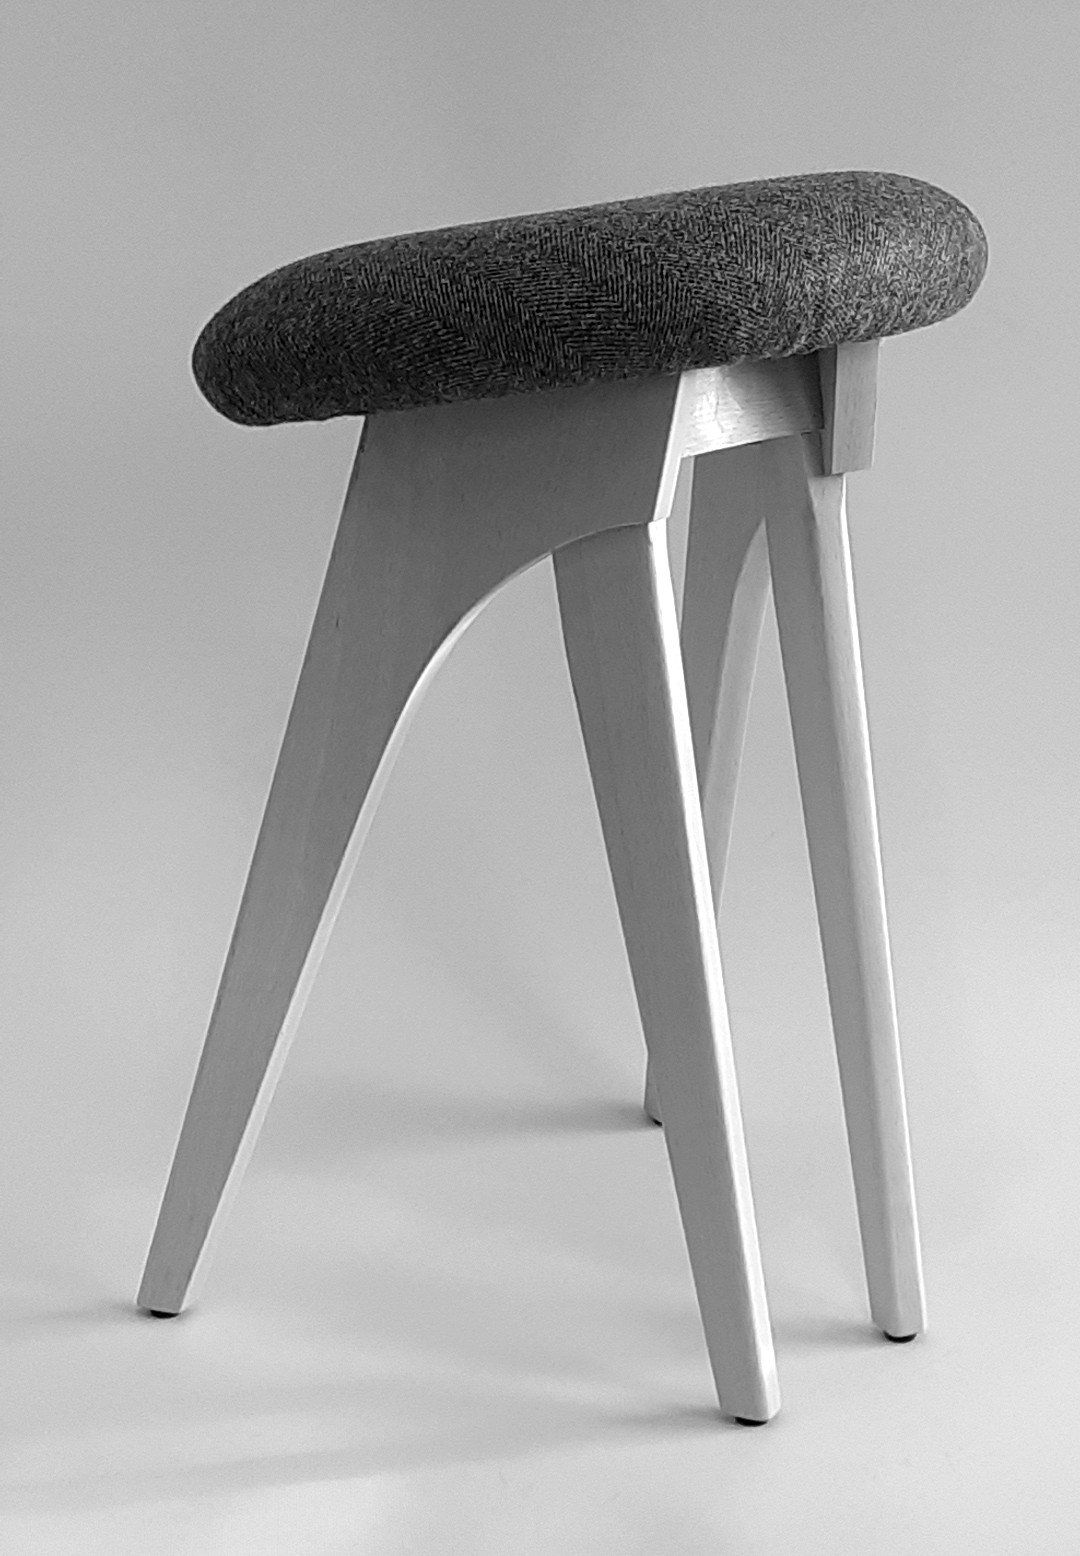 Harmony seat designed for posture